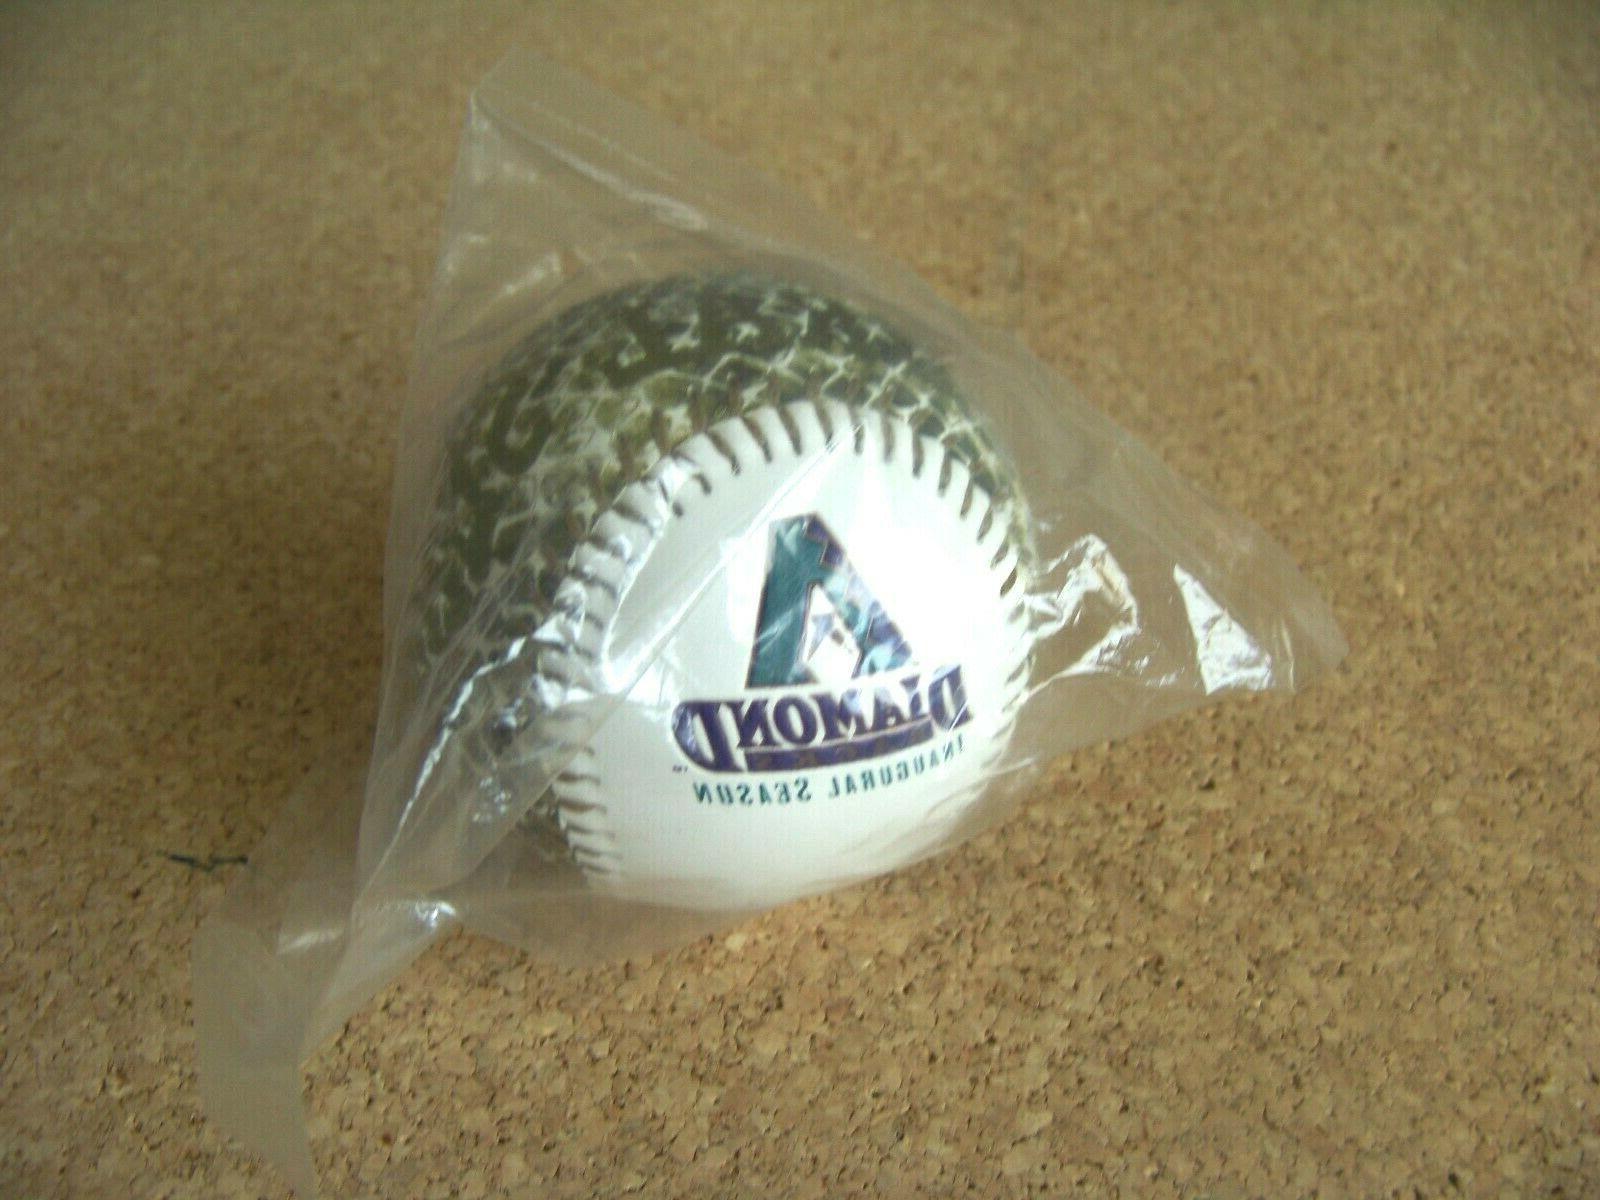 1998 Inaugural Season Diamondbacks ball design